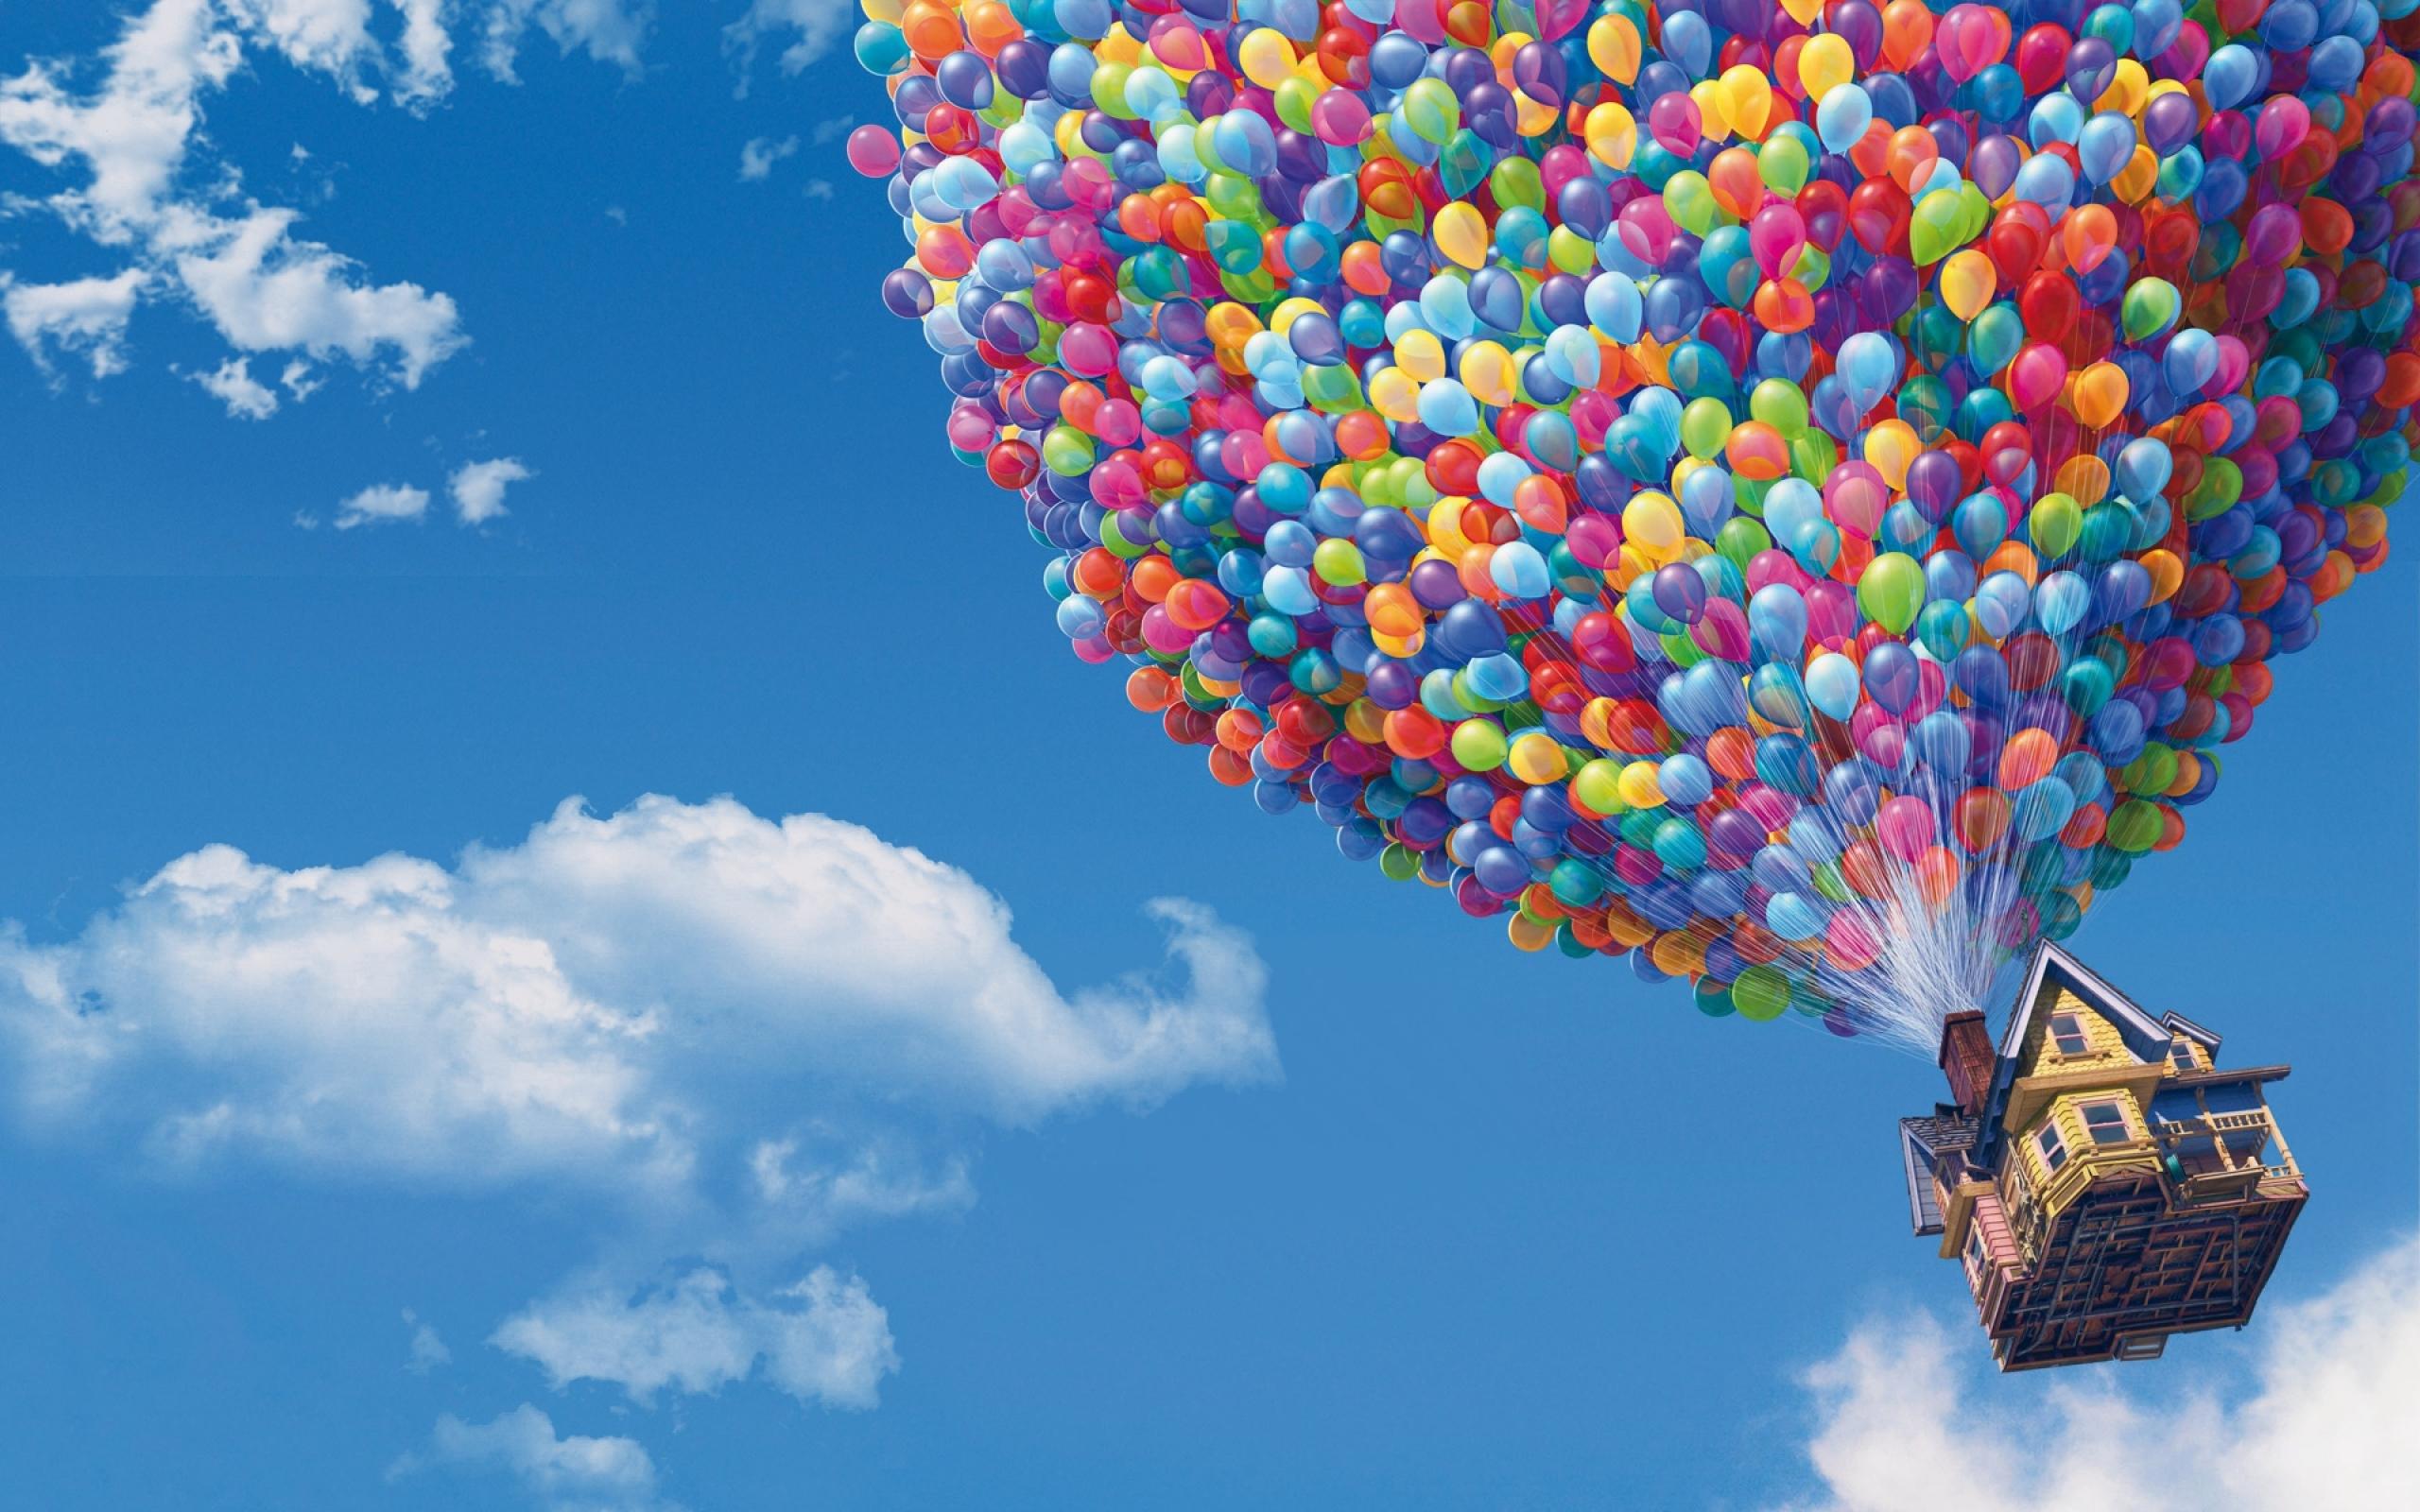 New Walt Disney HD Wallpapers   All HD Wallpapers 2560x1600